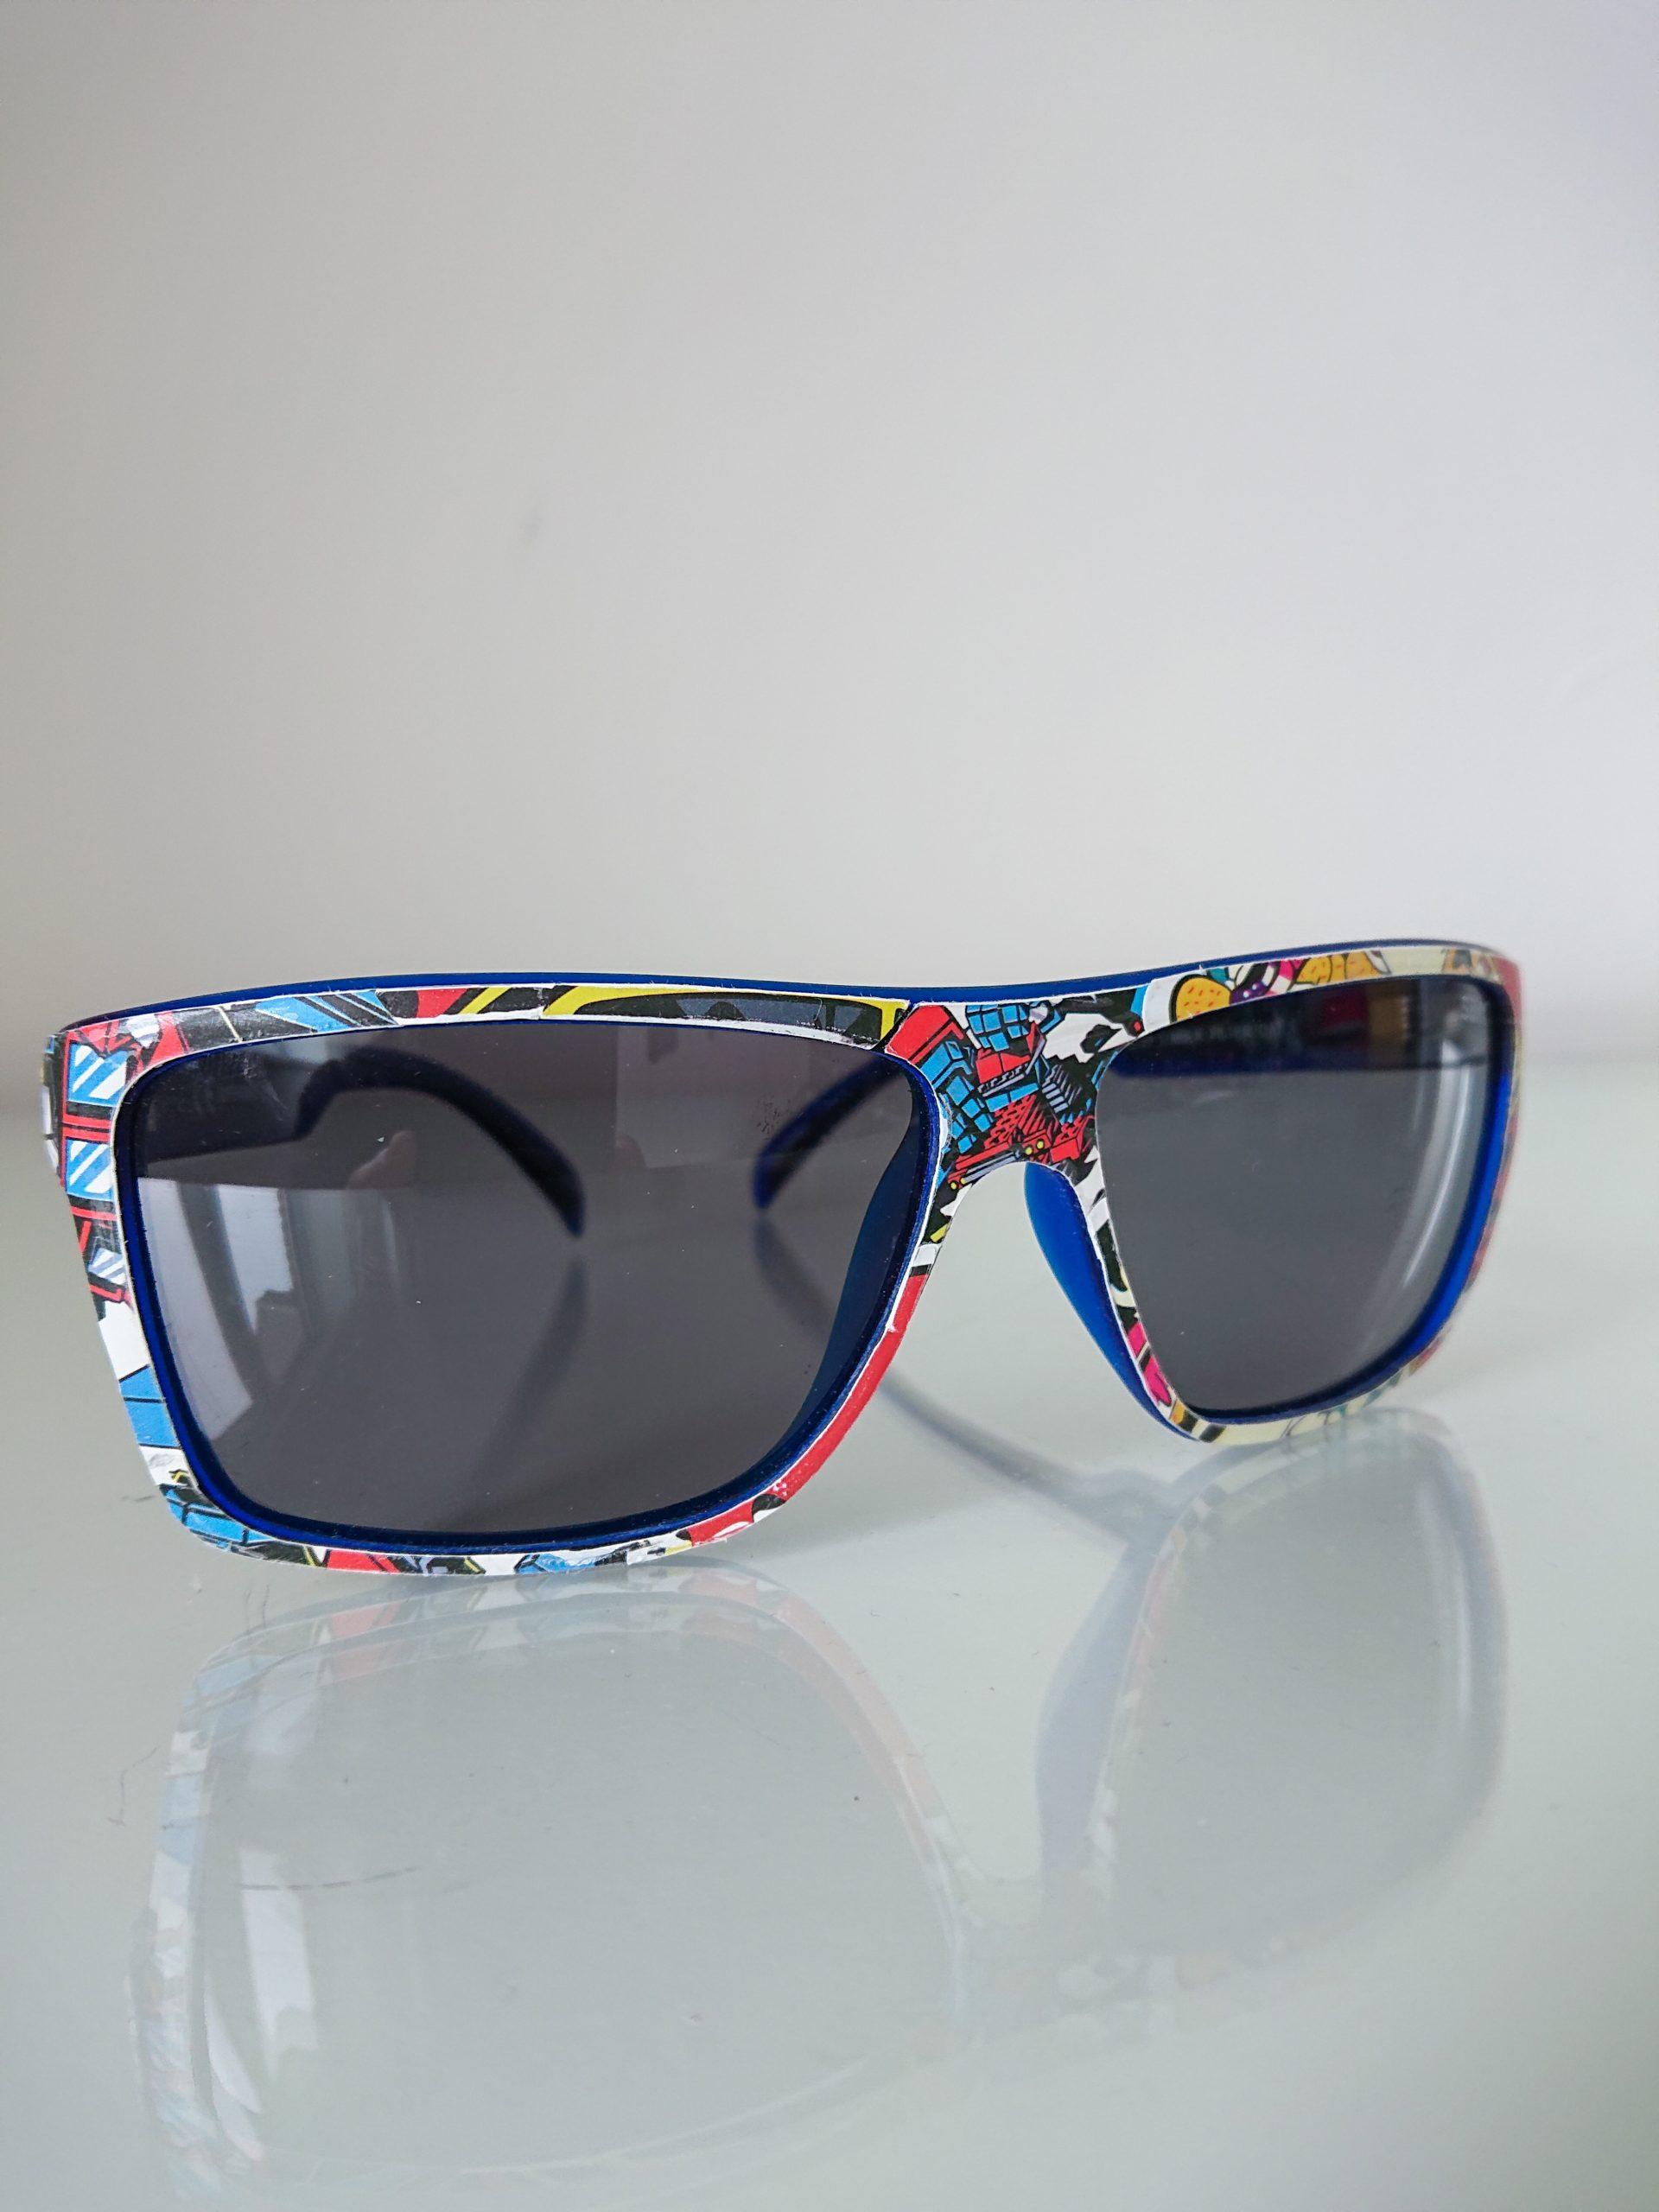 SBK Superbike Polarised Sunglasses